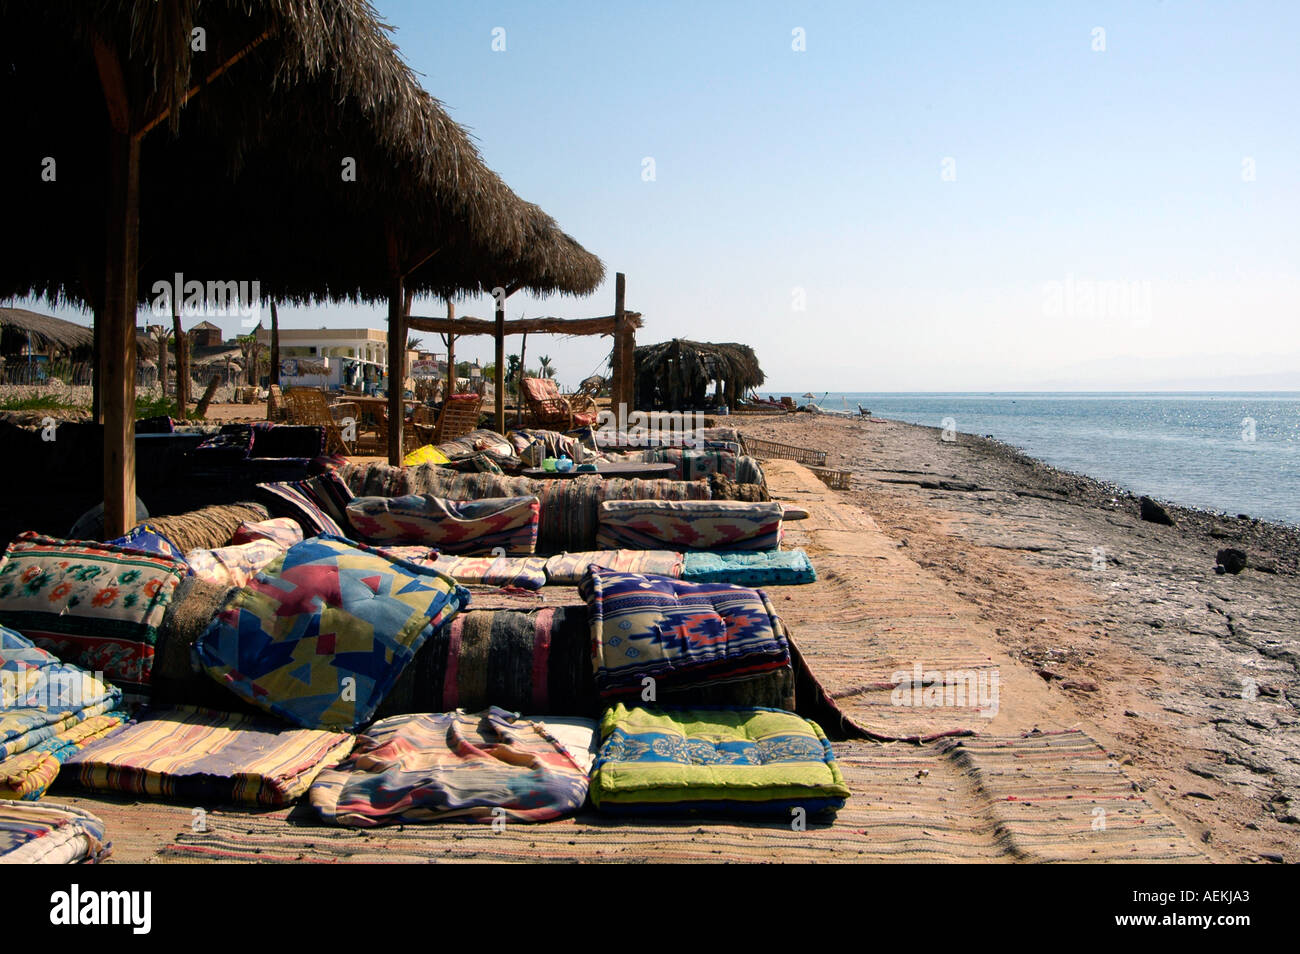 Sun loungers in Nuweiba Tarabin beach in Nuweiba also spelled: Nueiba a coastal town in the eastern part of Sinai Peninsula, Egypt - Stock Image